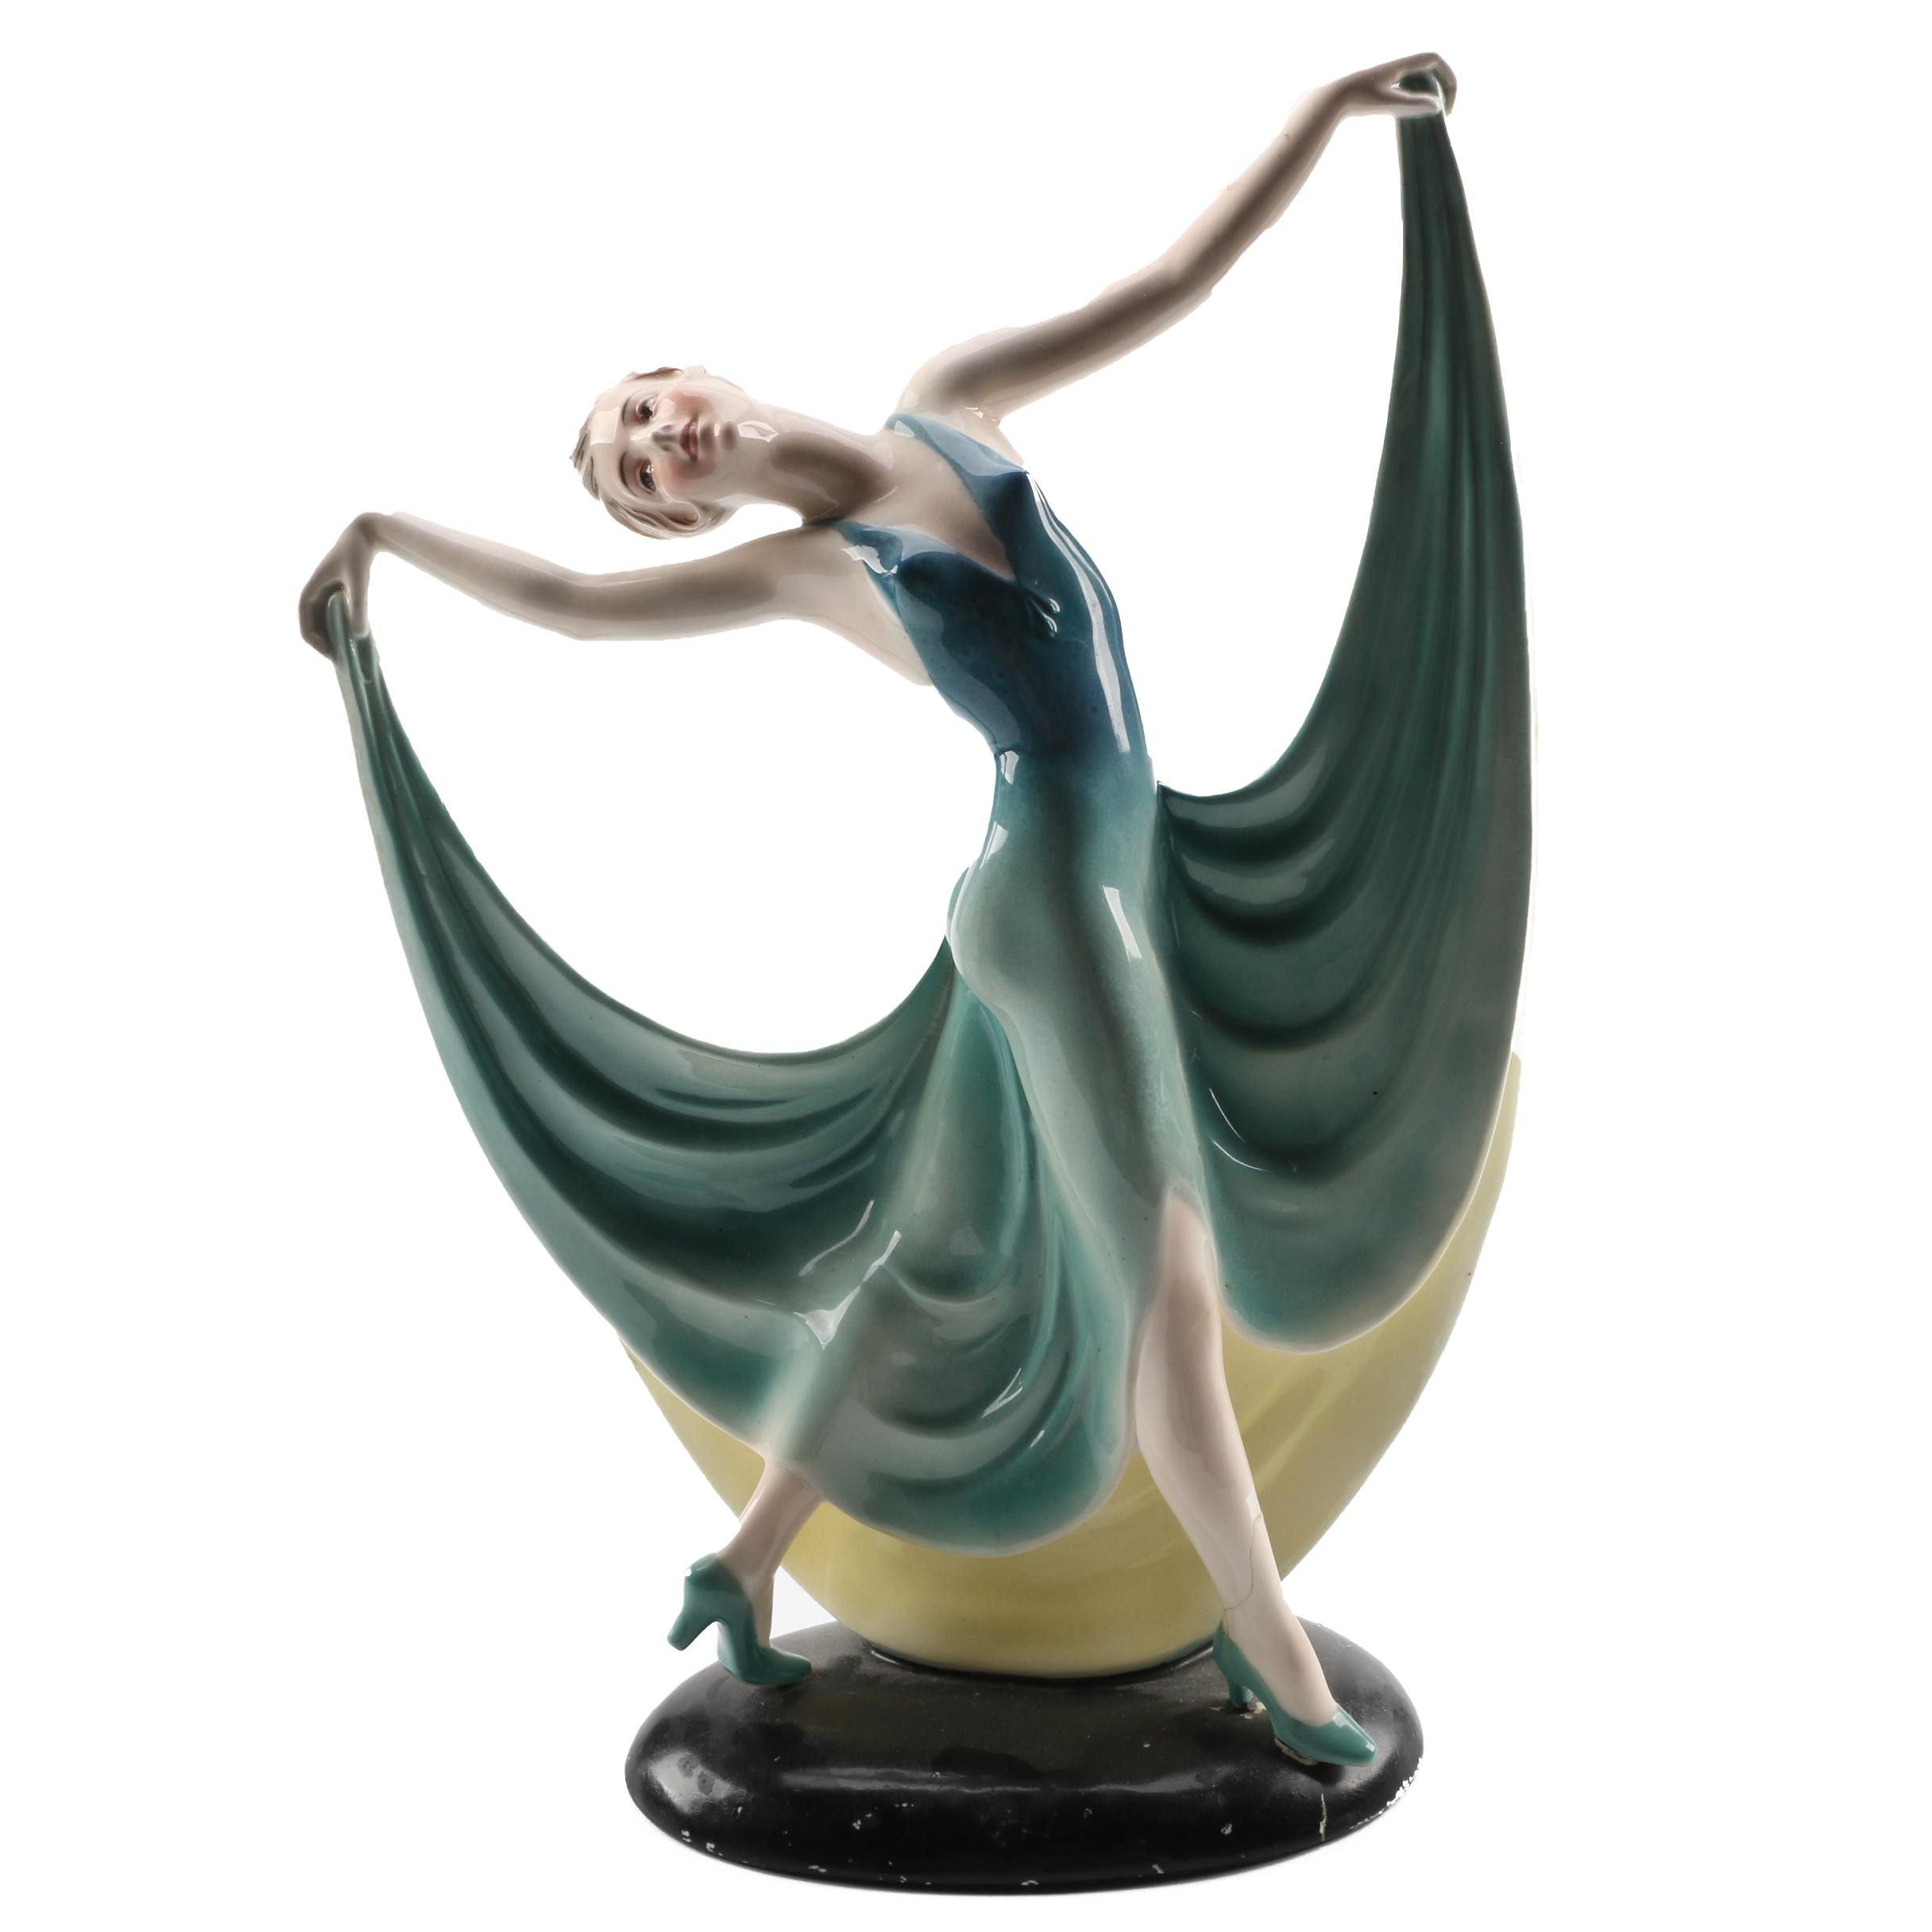 Hertwig & Co. Dancing Woman Figurine